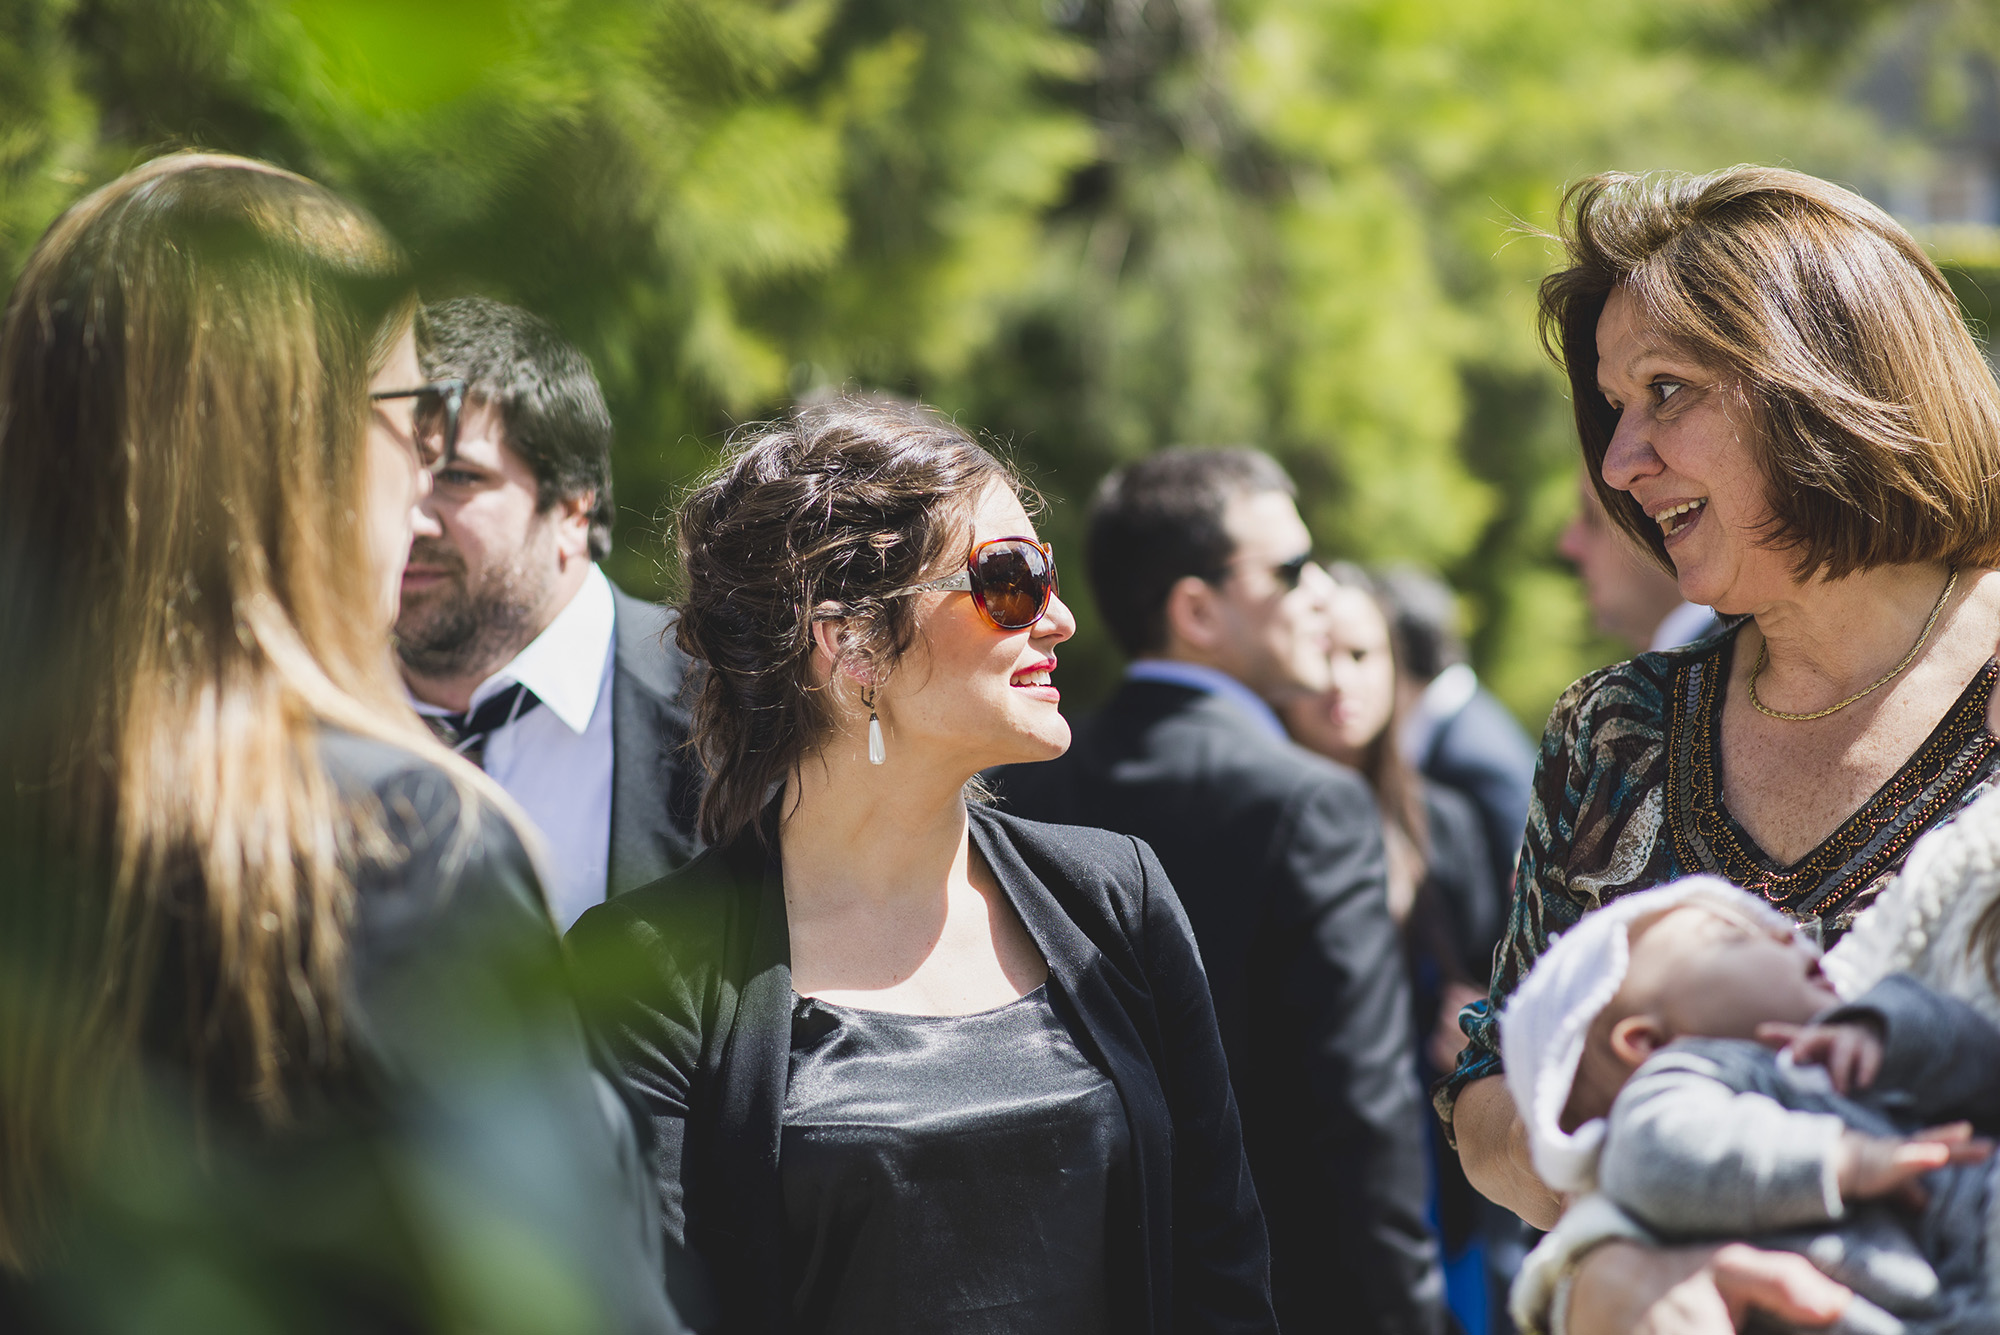 patricia-riba-casamiento-montevideo-uruguay-lindolfo-55